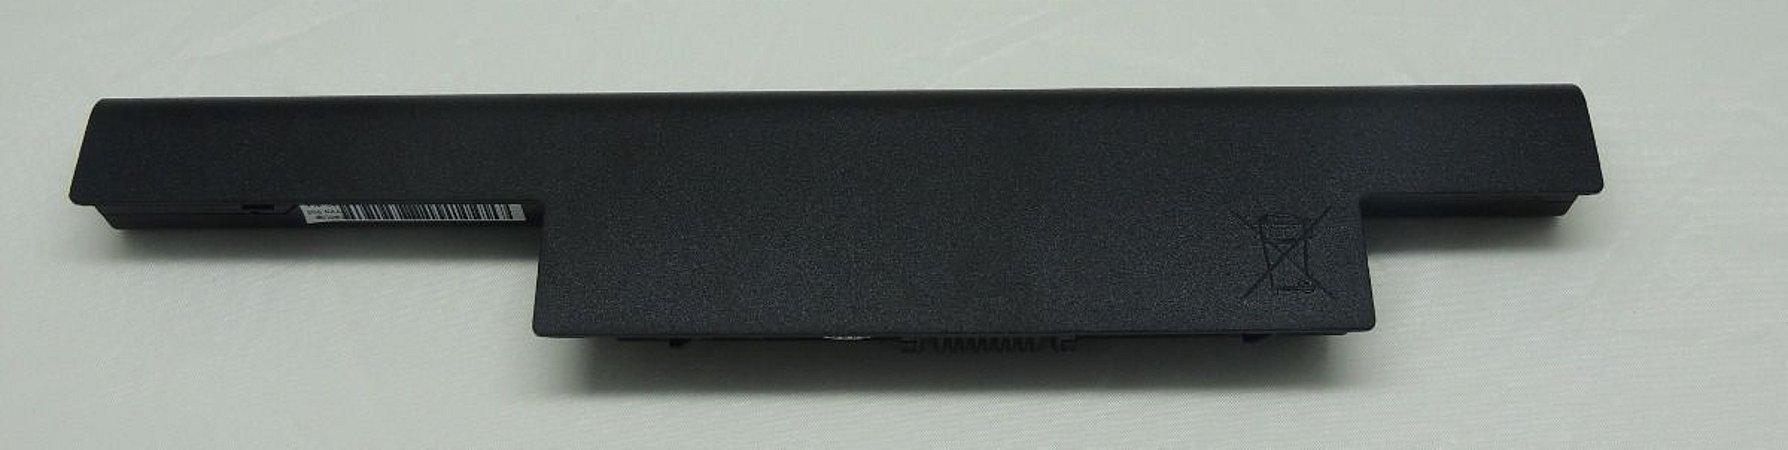 bateria As10d31 Notebook Gateway Ne56r16b